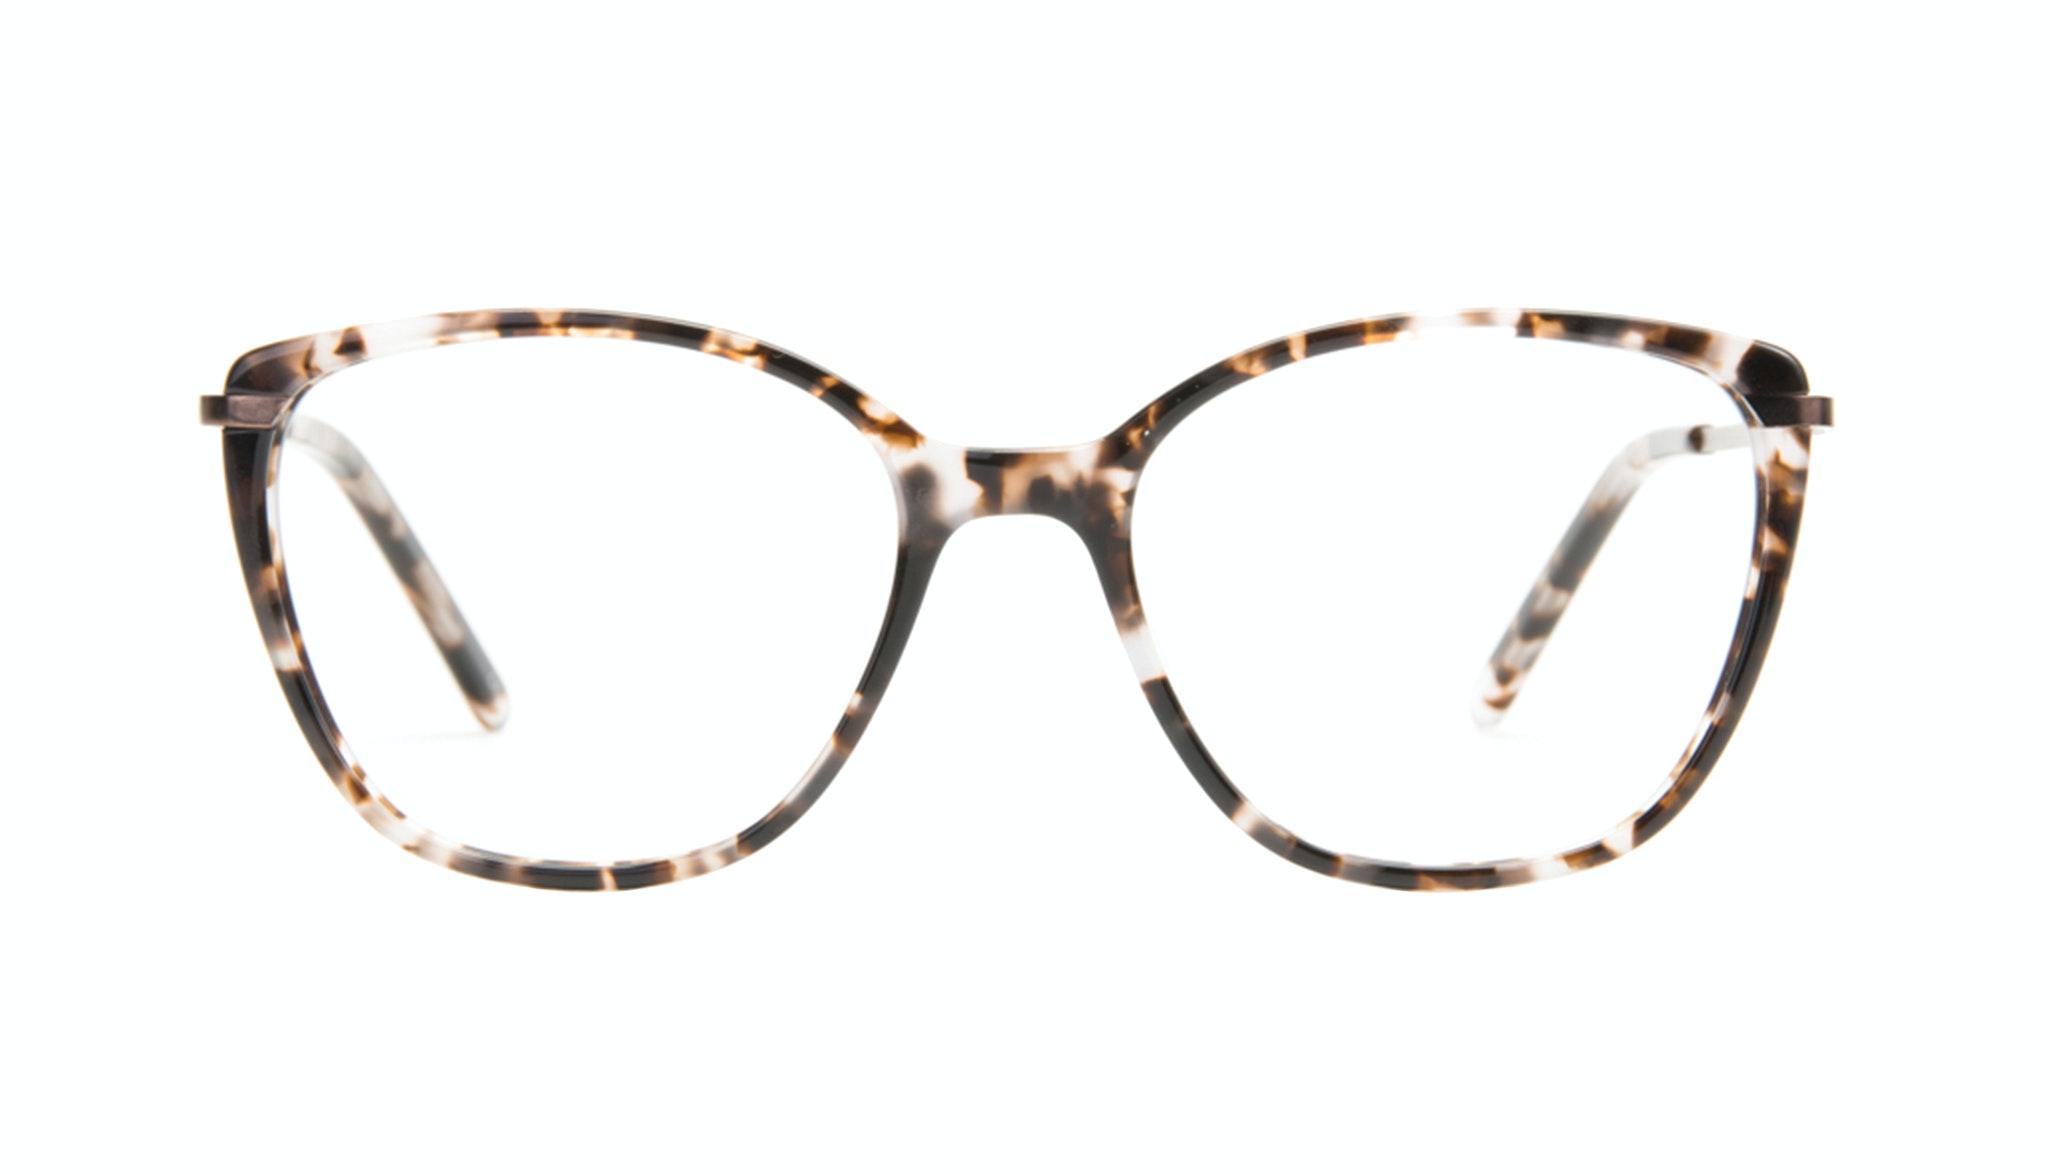 Affordable Fashion Glasses Cat Eye Rectangle Square Eyeglasses Women Illusion Sand Front